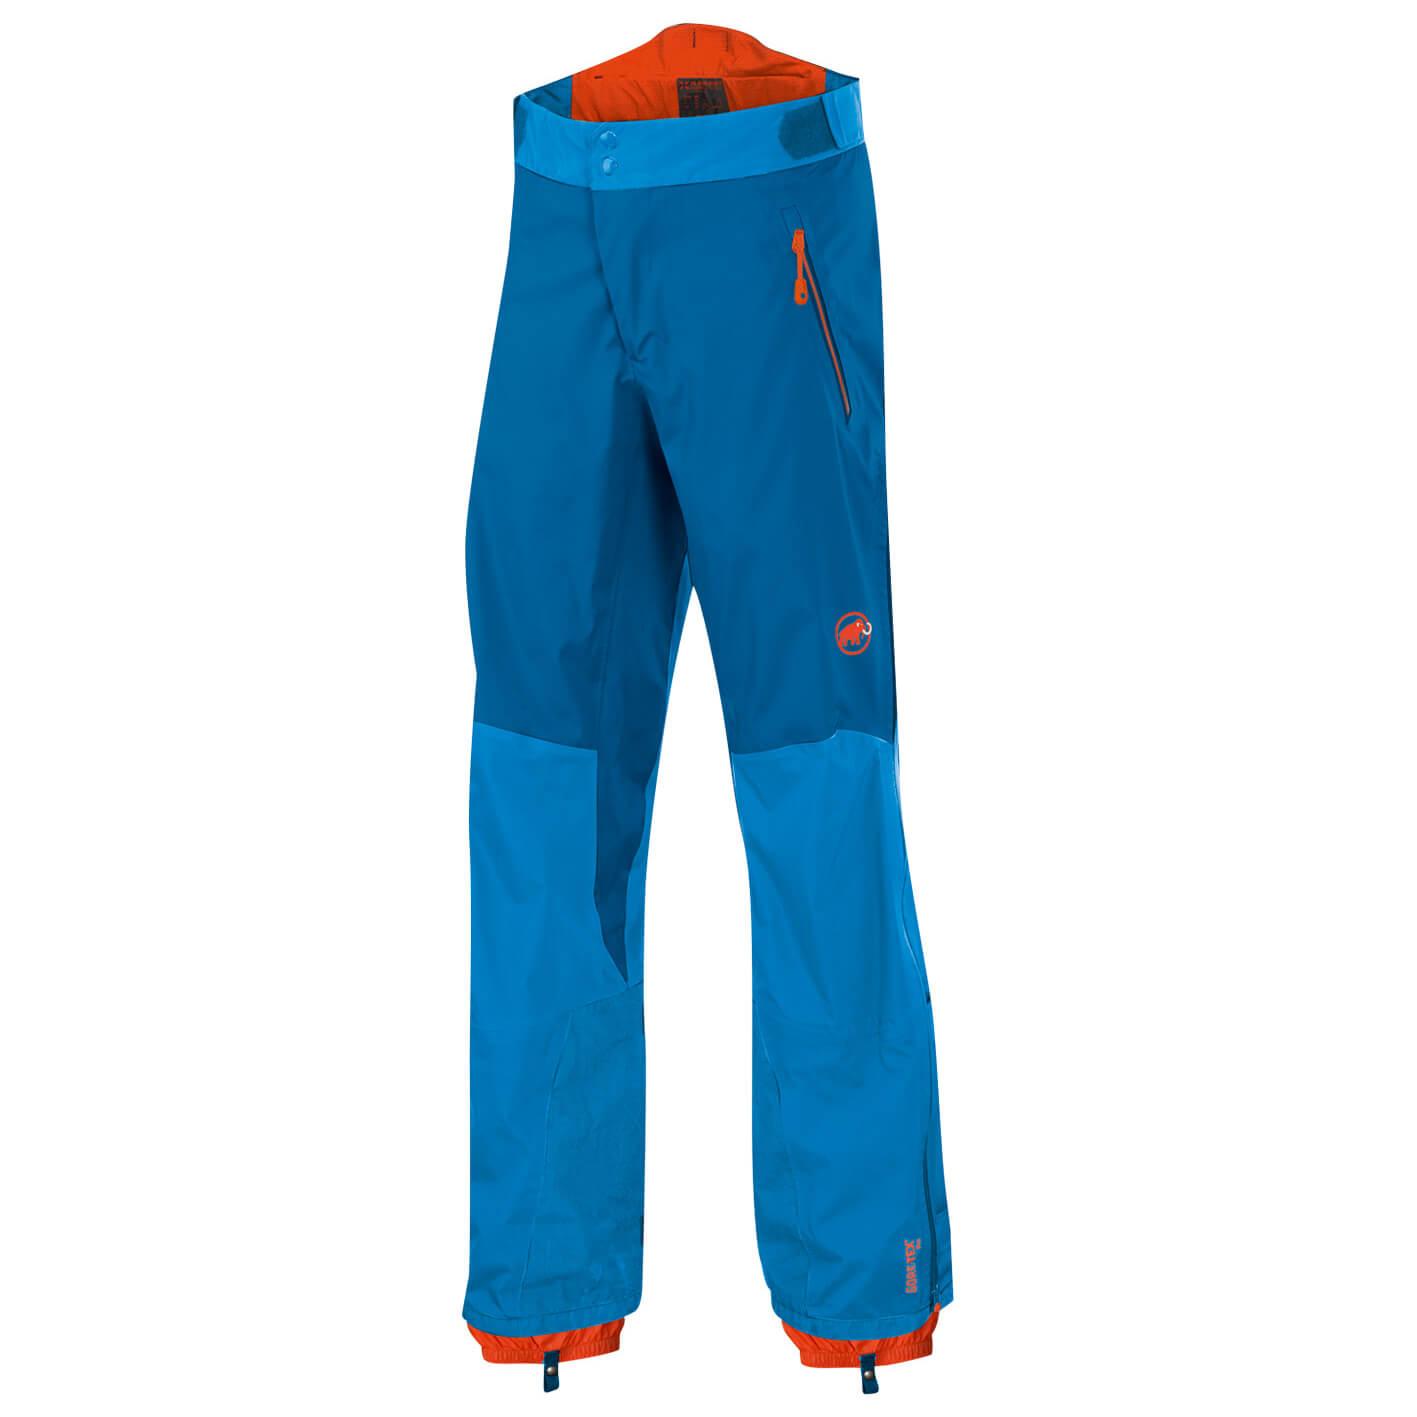 98d171aaf43944 Mammut Nordwand Pro HS Pants - Waterproof trousers Men s